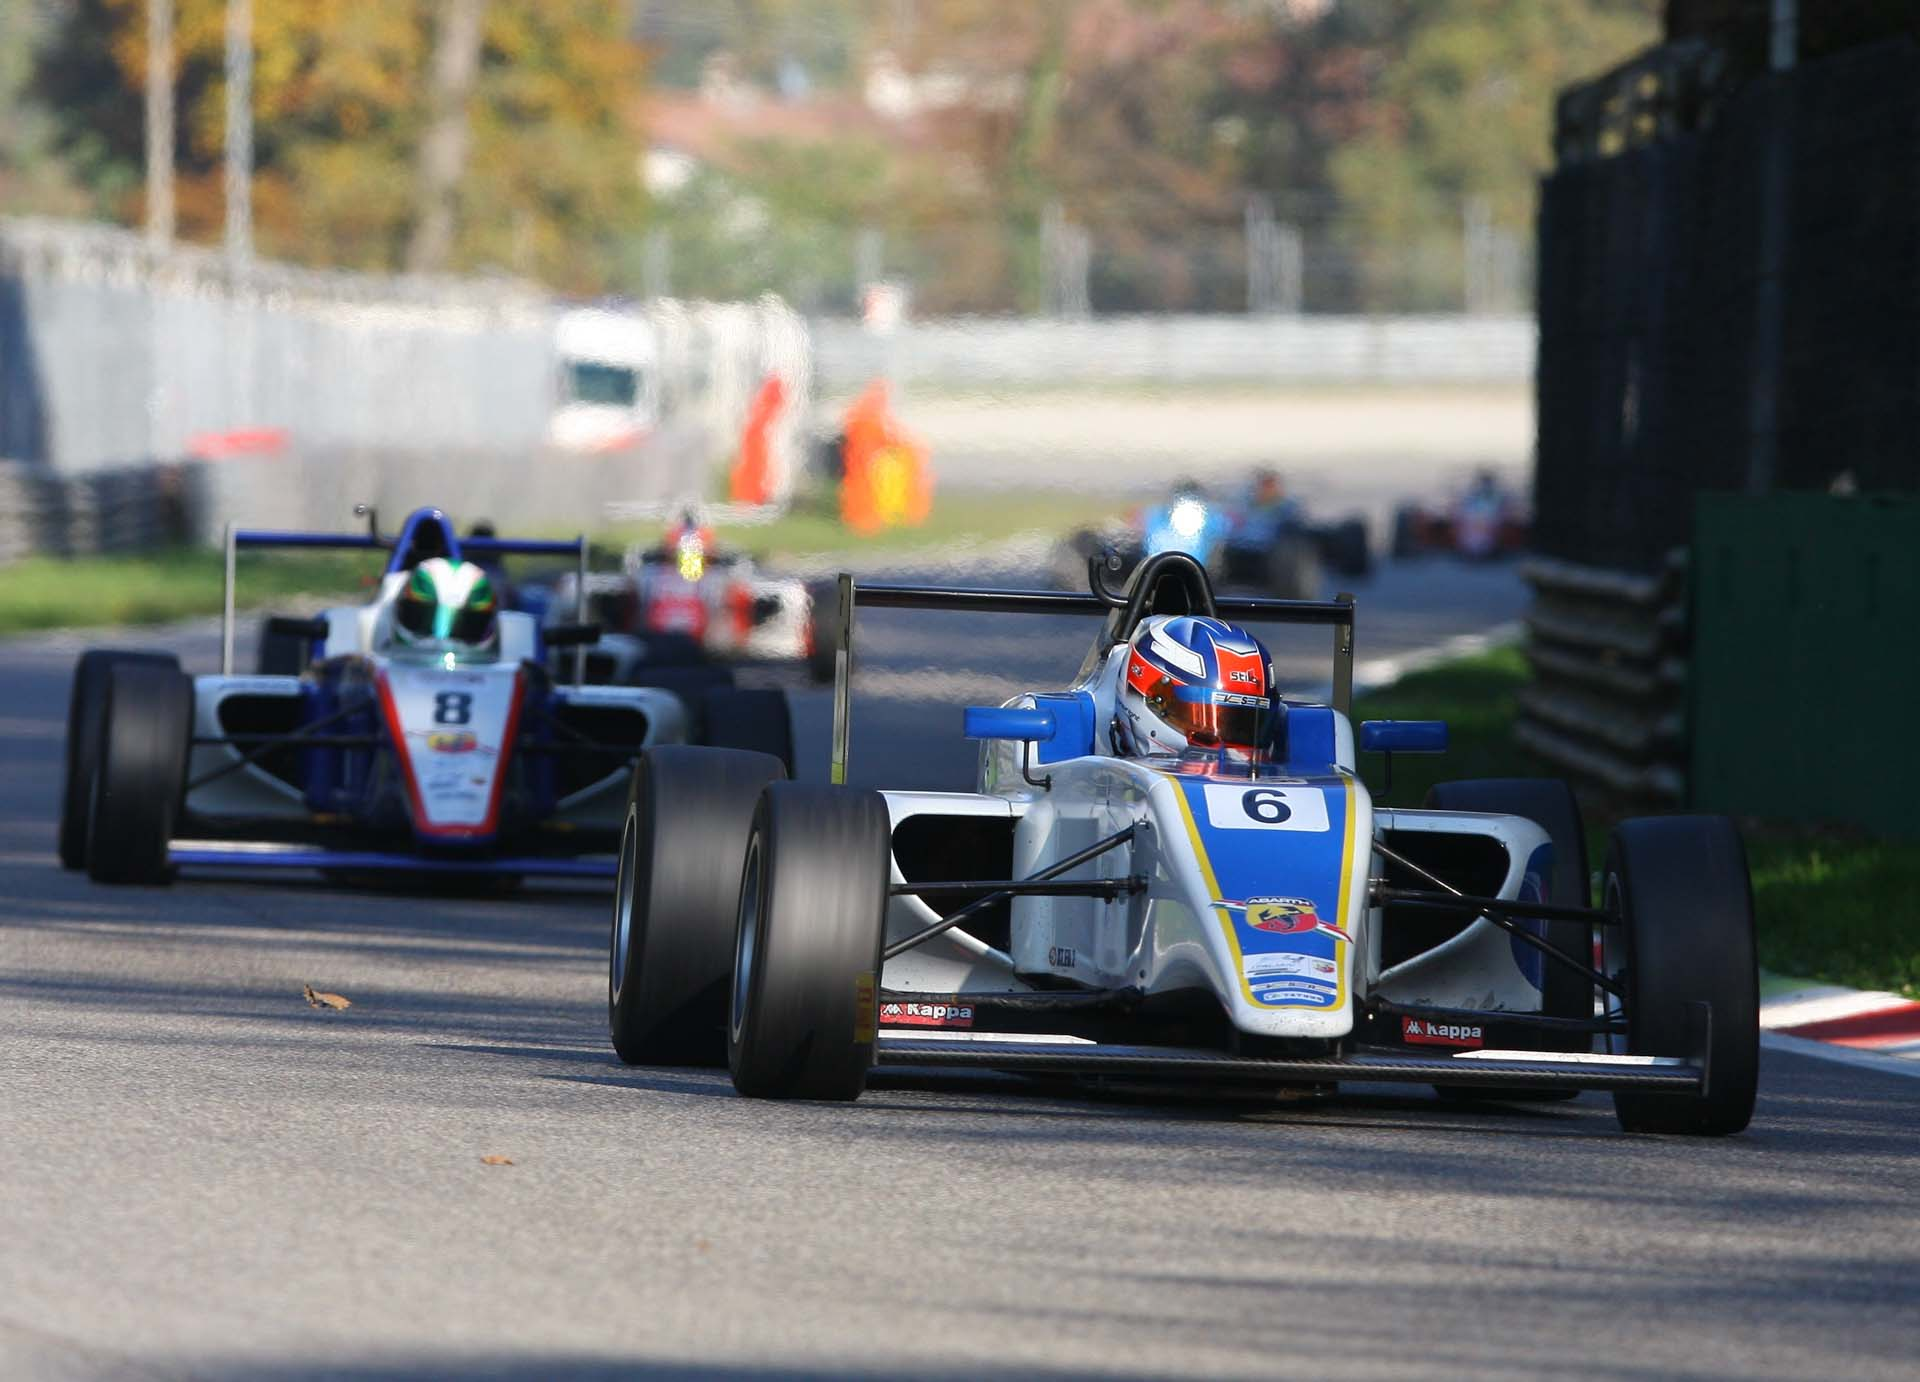 2016 Monza - VSR Jaden (11)a